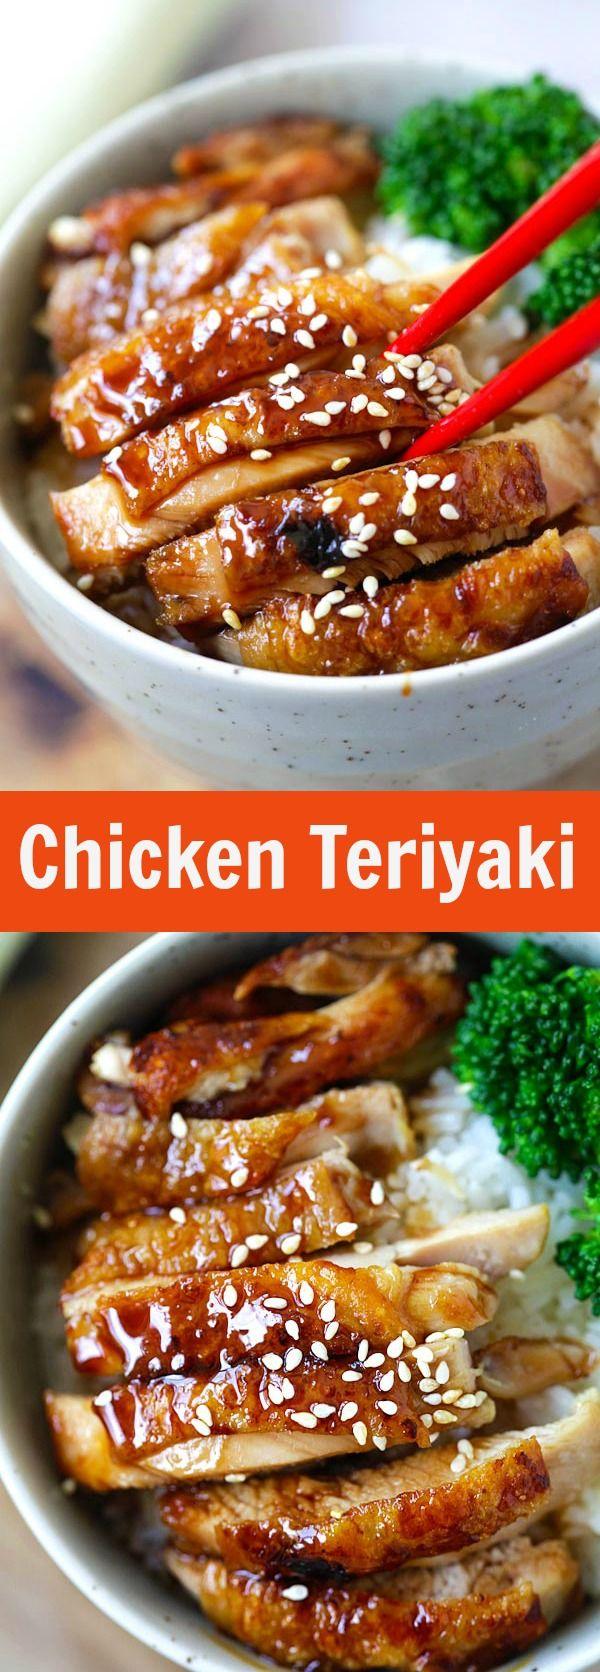 Chicken Teriyaki – chicken teriyaki that taste like the best Japanese restaurants. So easy and so good | rasamalaysia.com